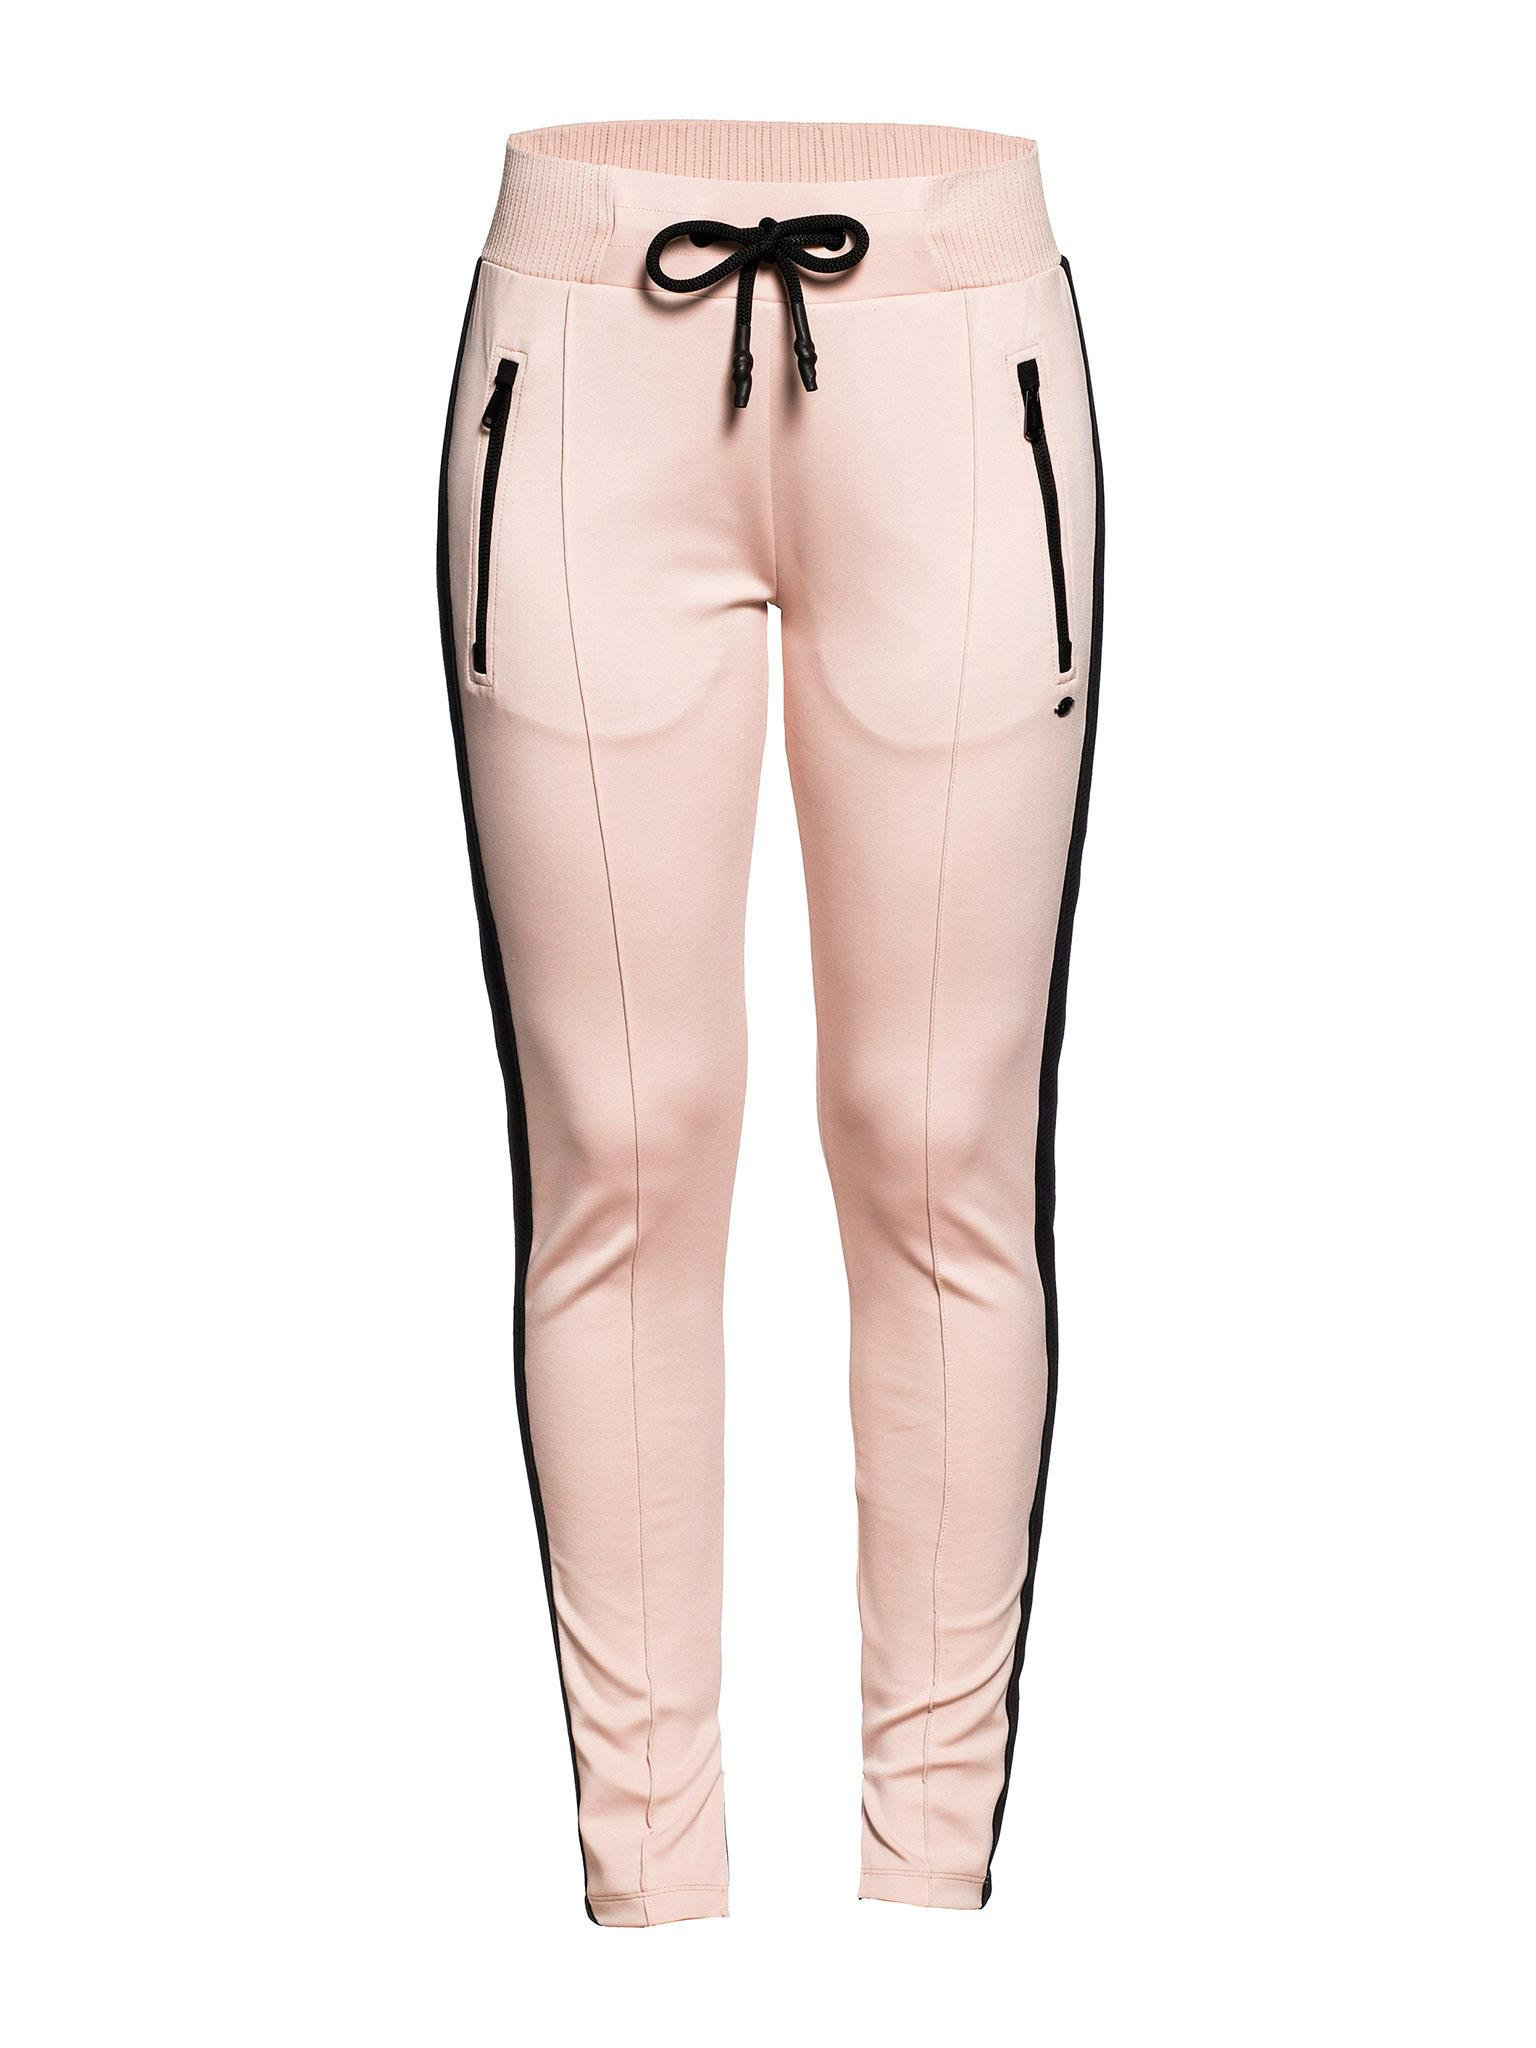 Pastel roze dames sport broek Goldbergh - Aphro